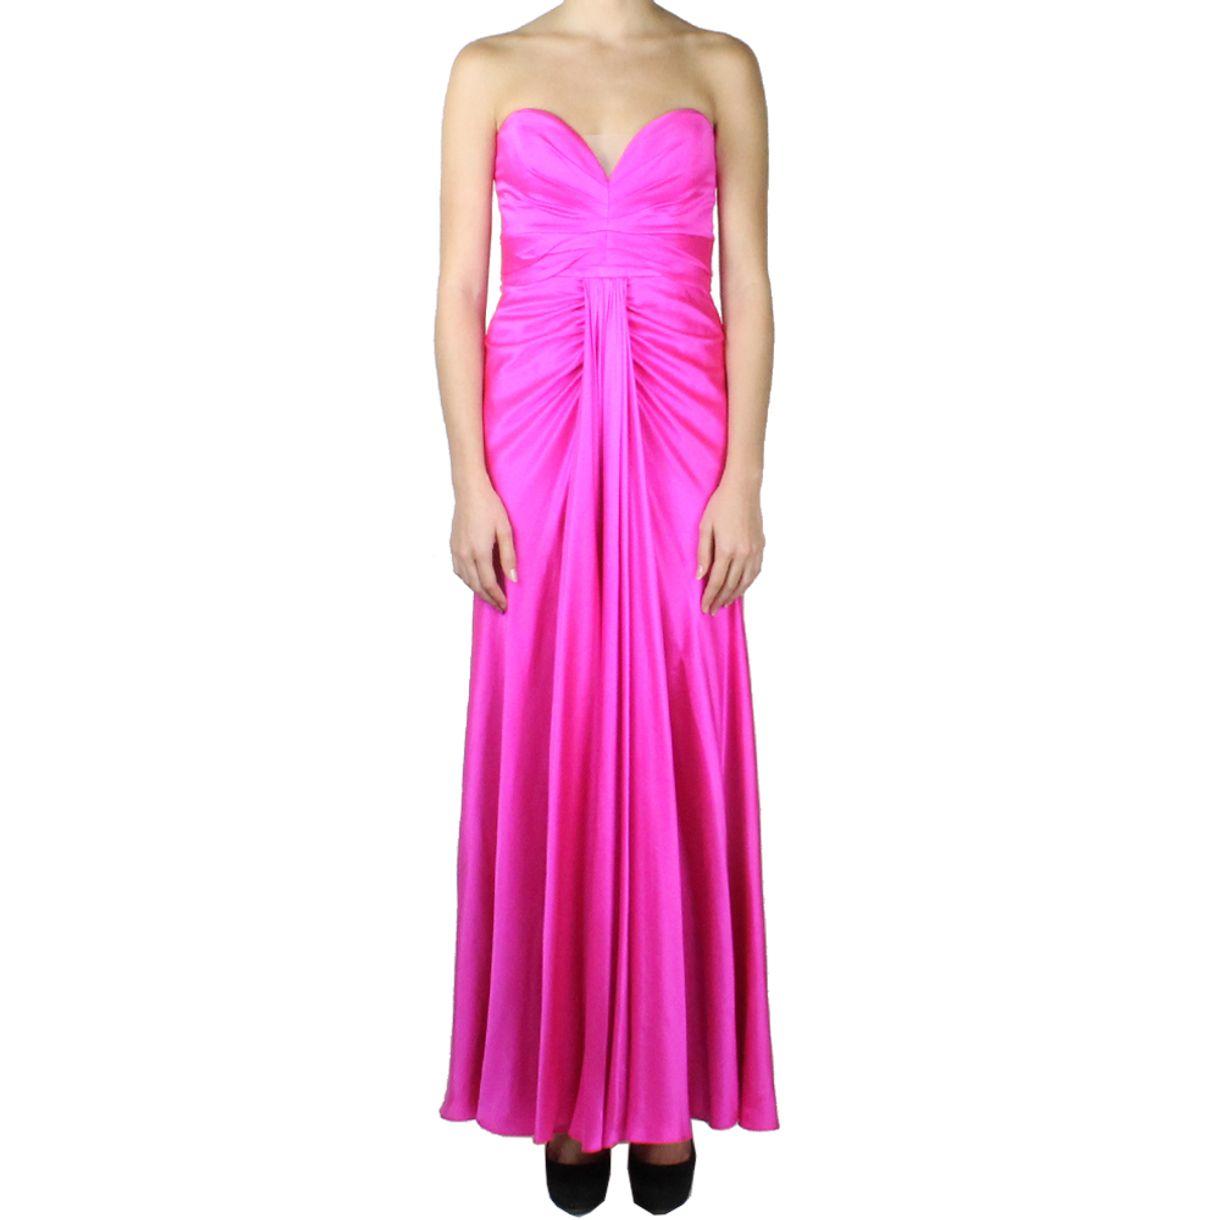 8396-vestido-longo-printing-cetim-rosa-1